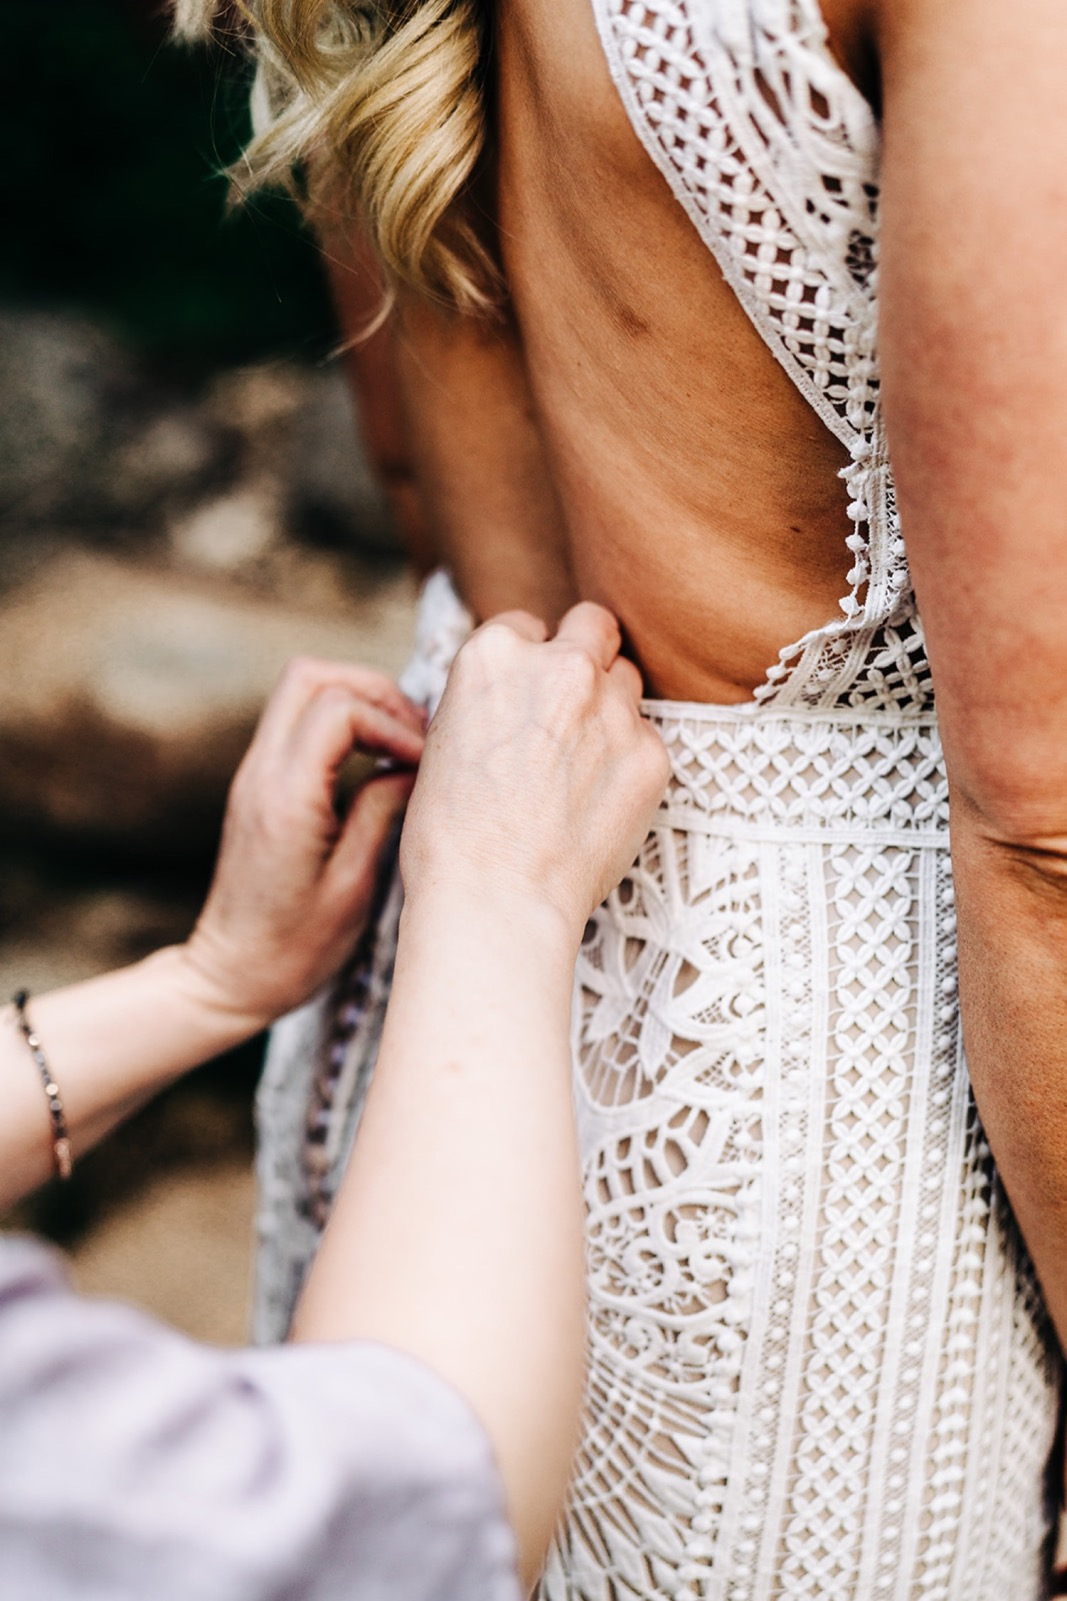 018_falissa_heather_wedding-44.jpg